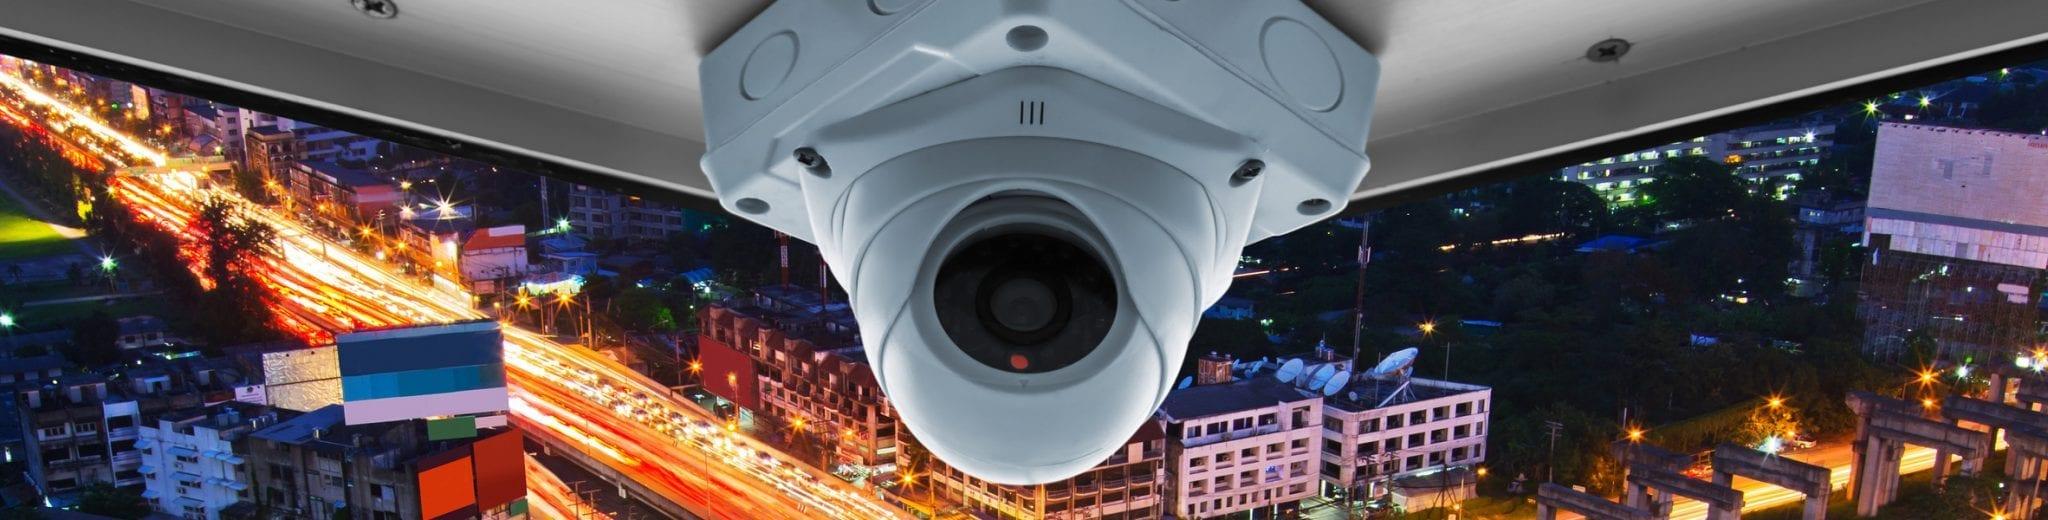 security cameras on a balcony high building